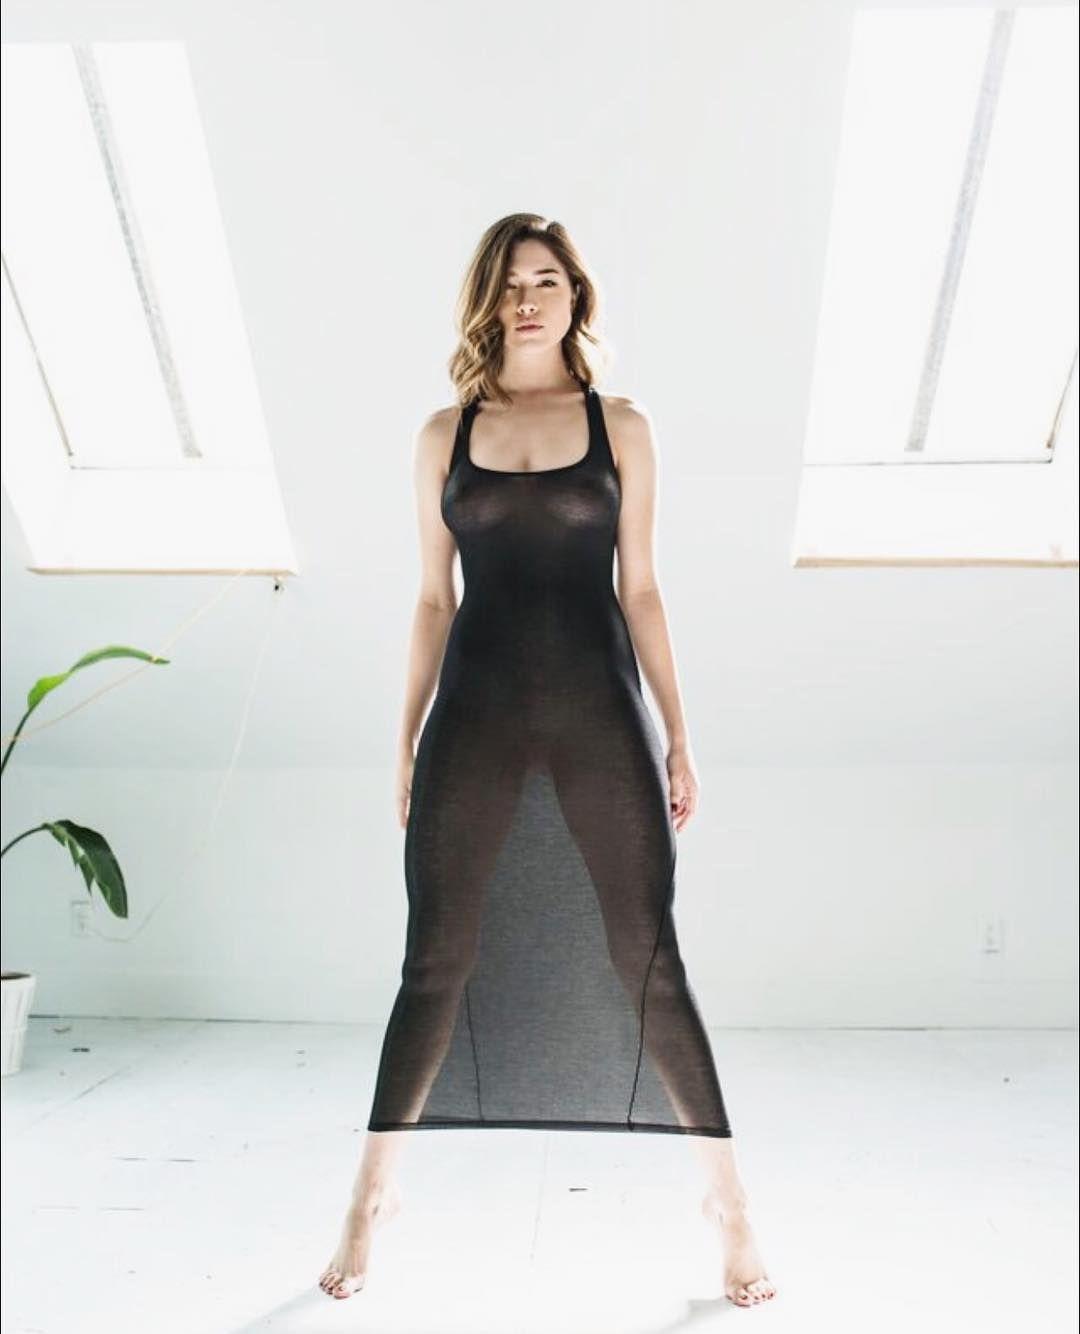 Goddess Lauren Summers | WtSSTaDaMiT